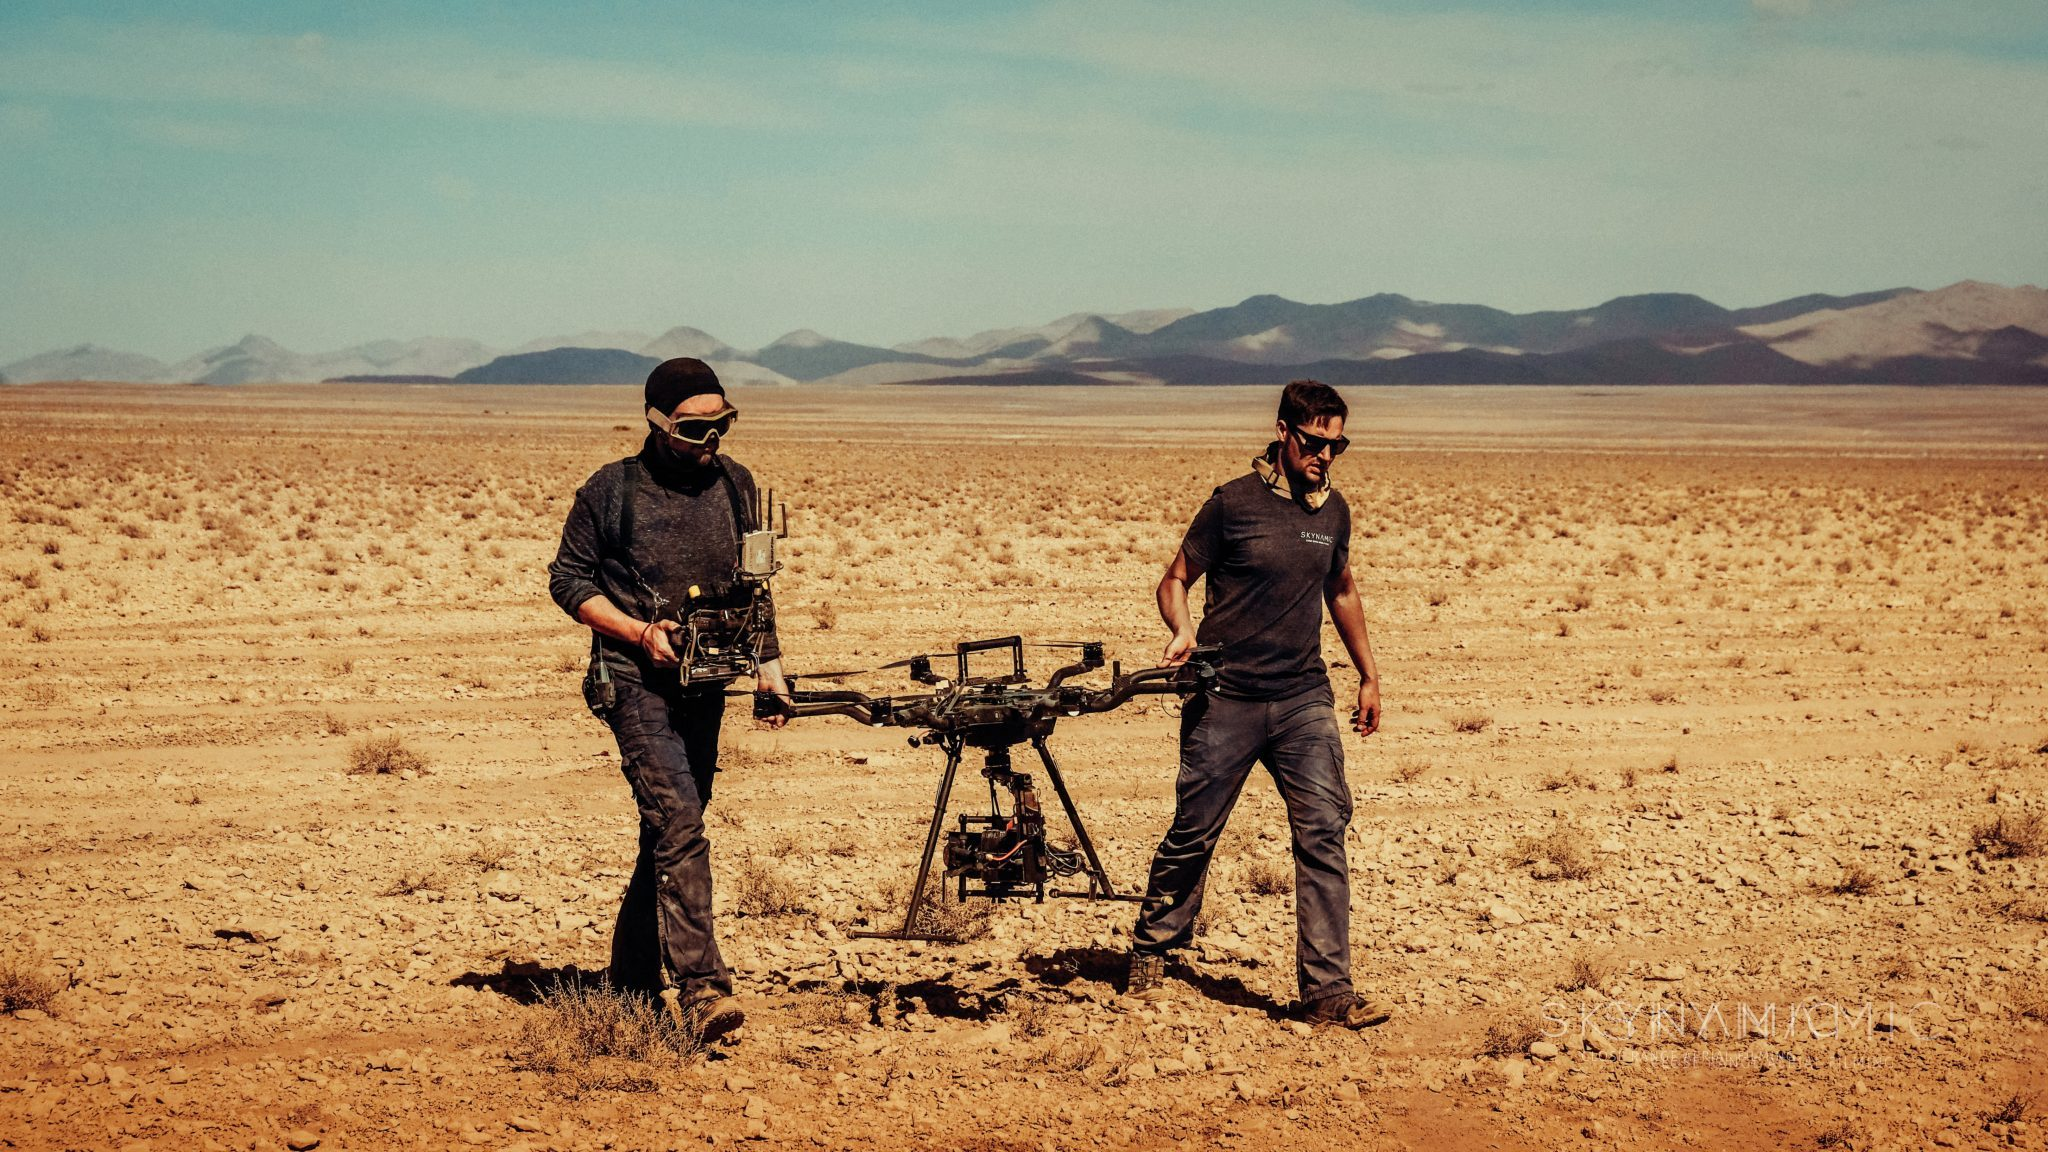 Morocco_Cinema_Drone_Sahara